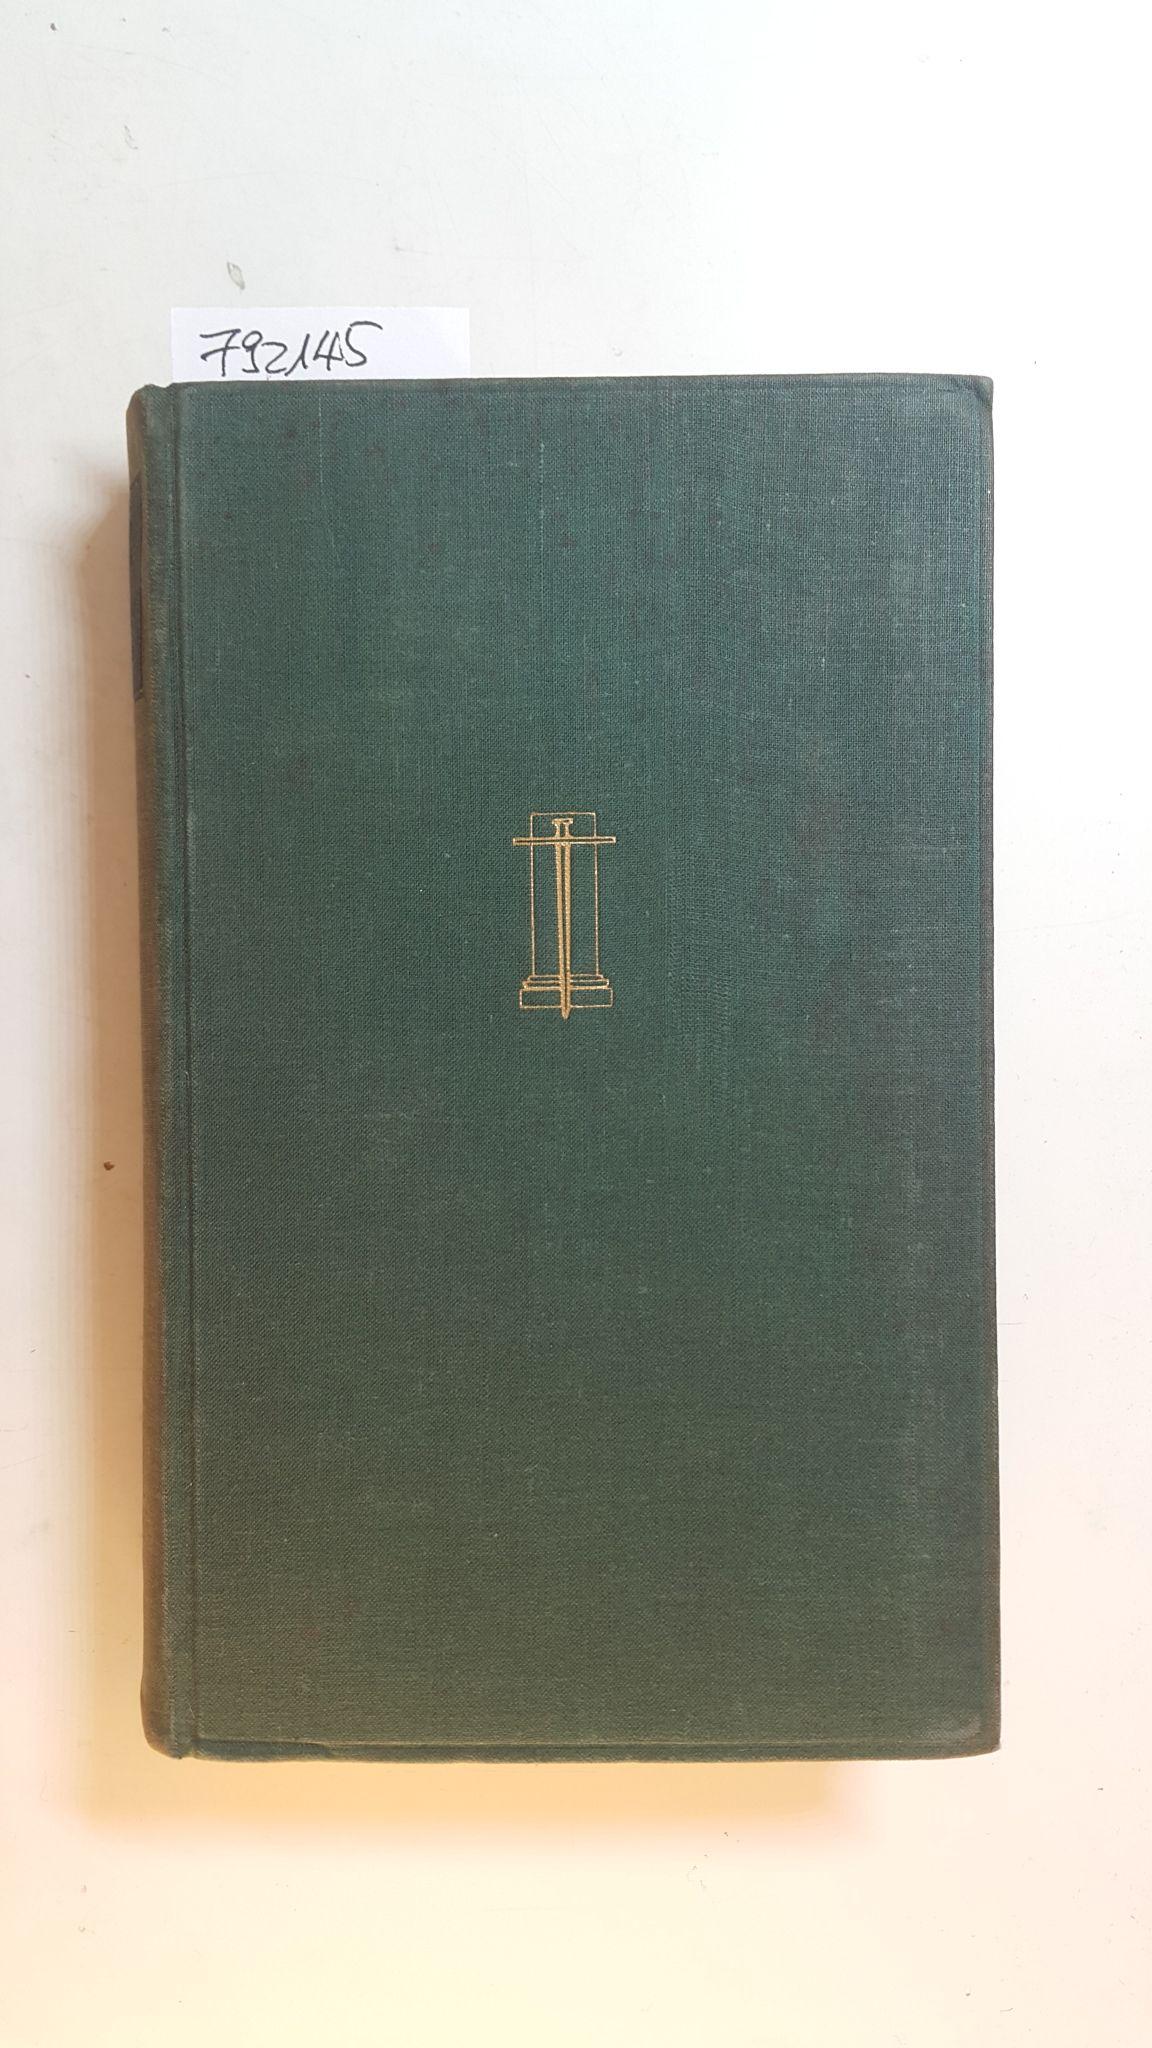 Ursprung und Aufbau des lebendigen Kosmos - Conrad-Martius, Hedwig